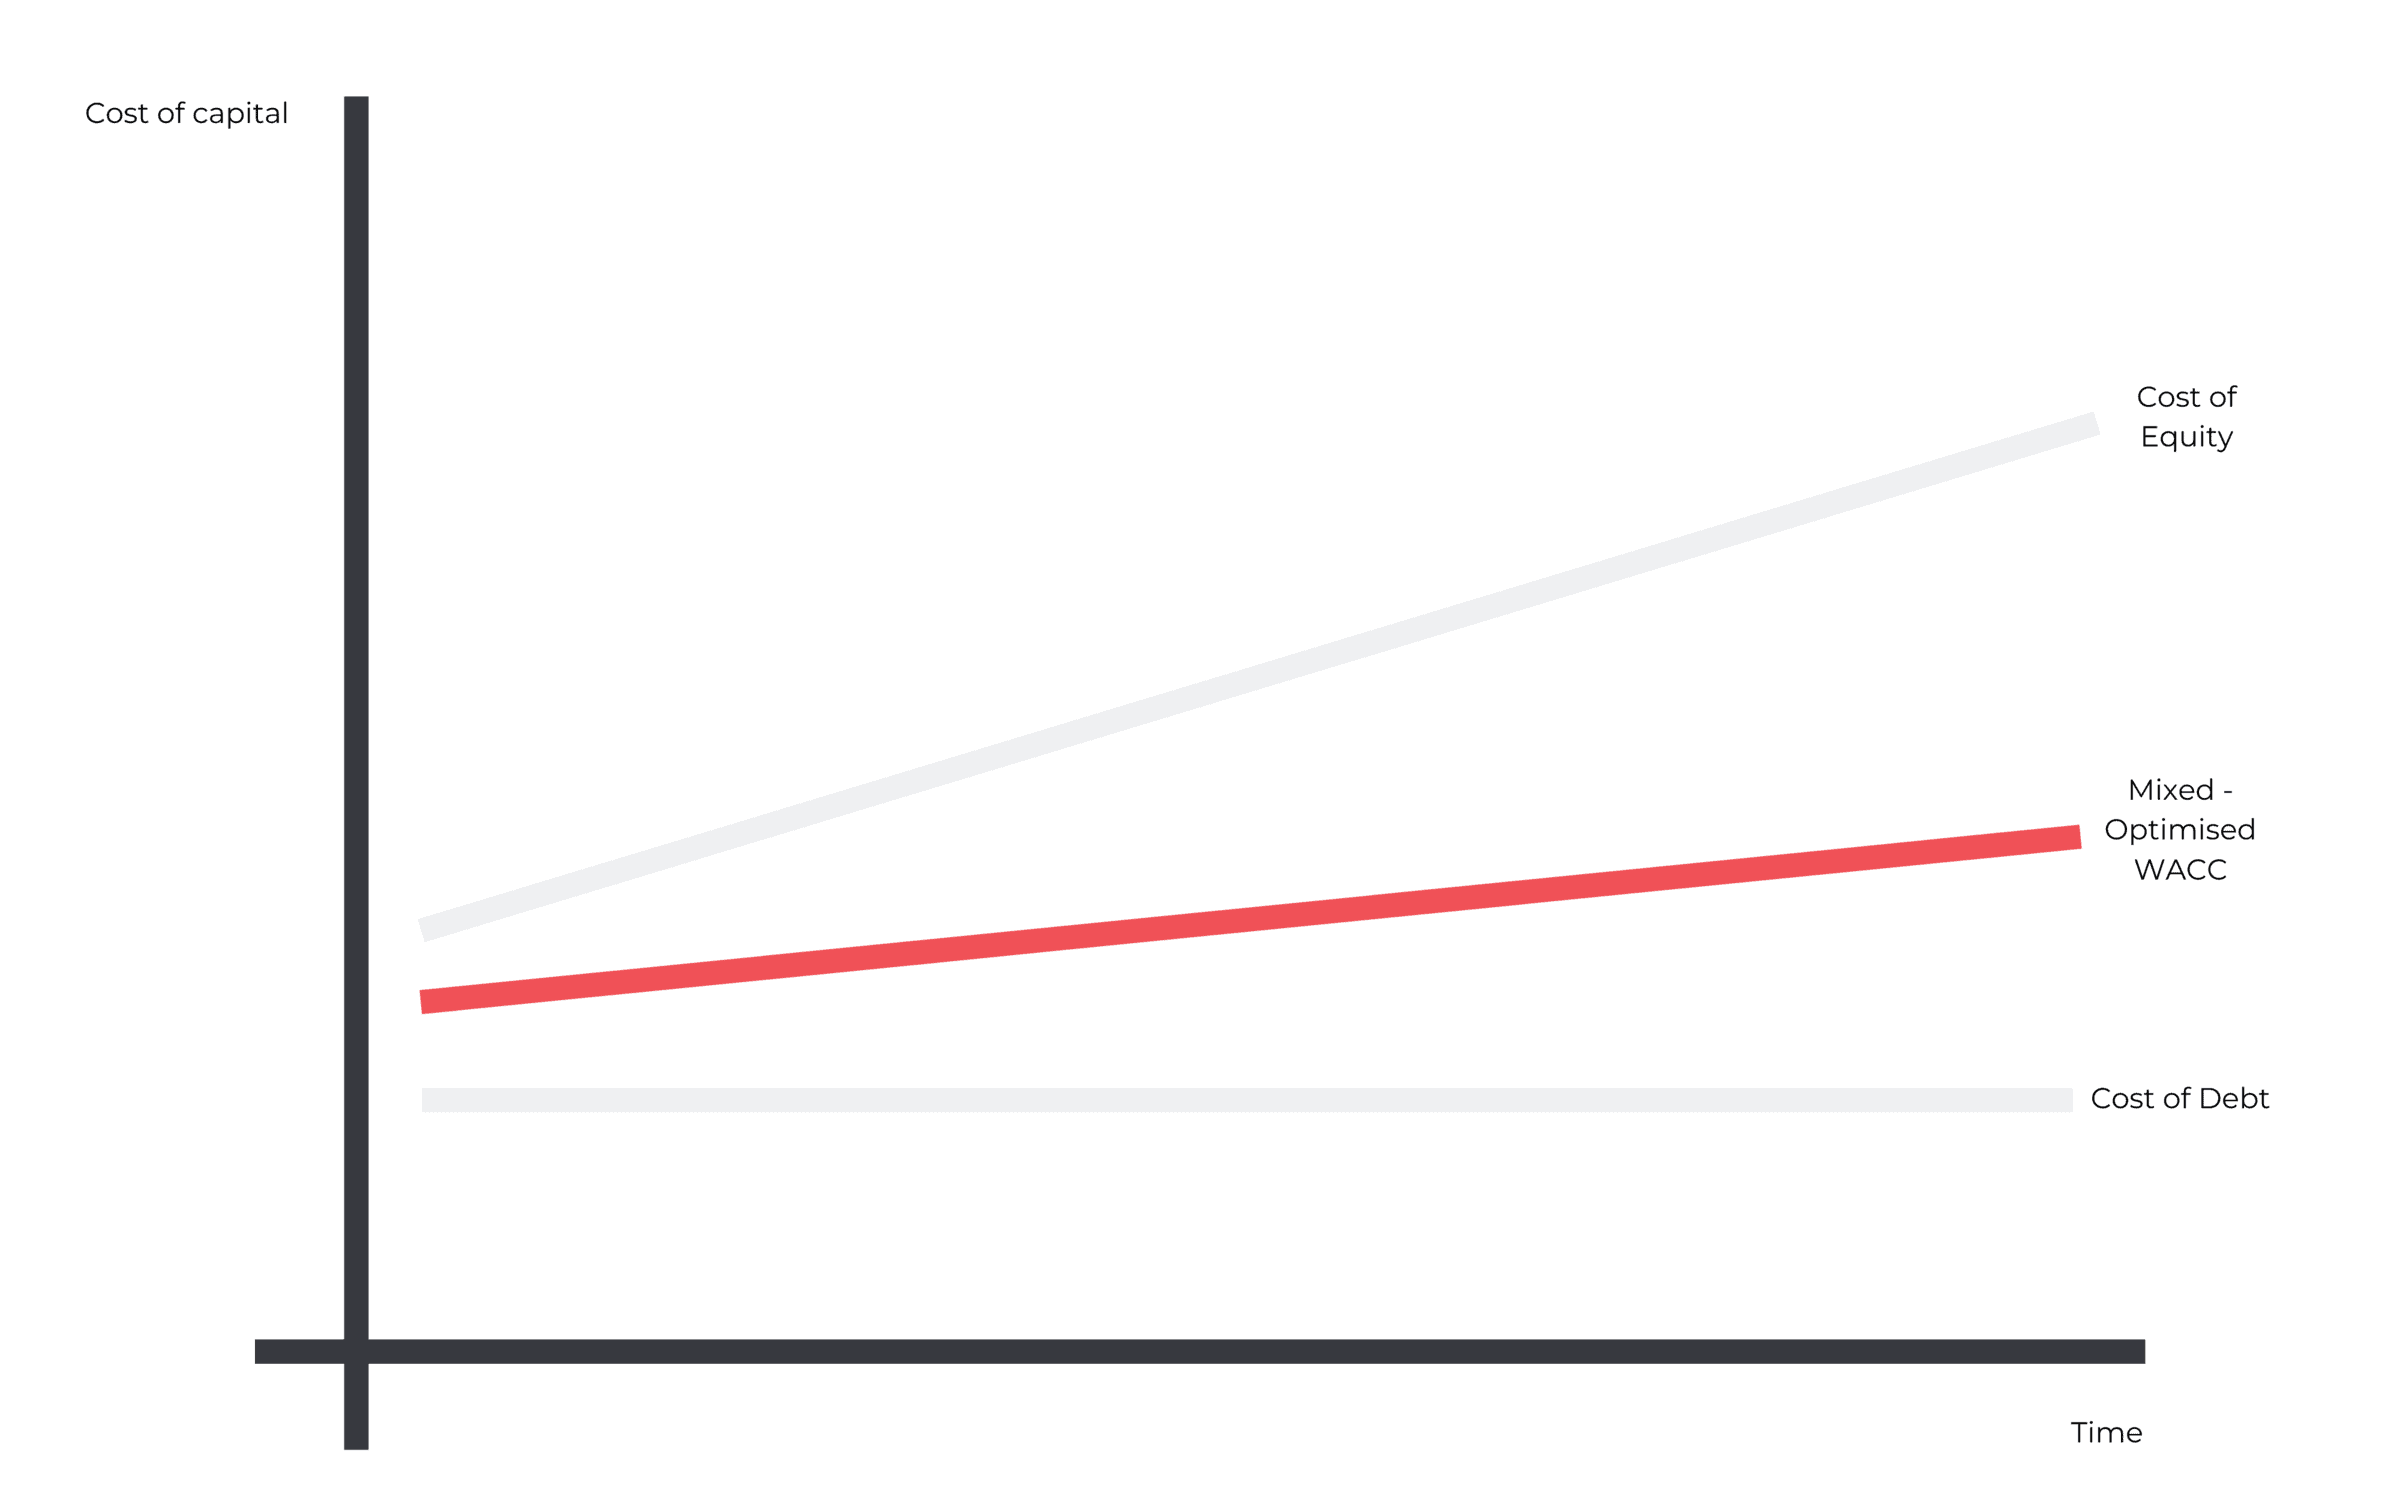 wacc chart R&D debt equity